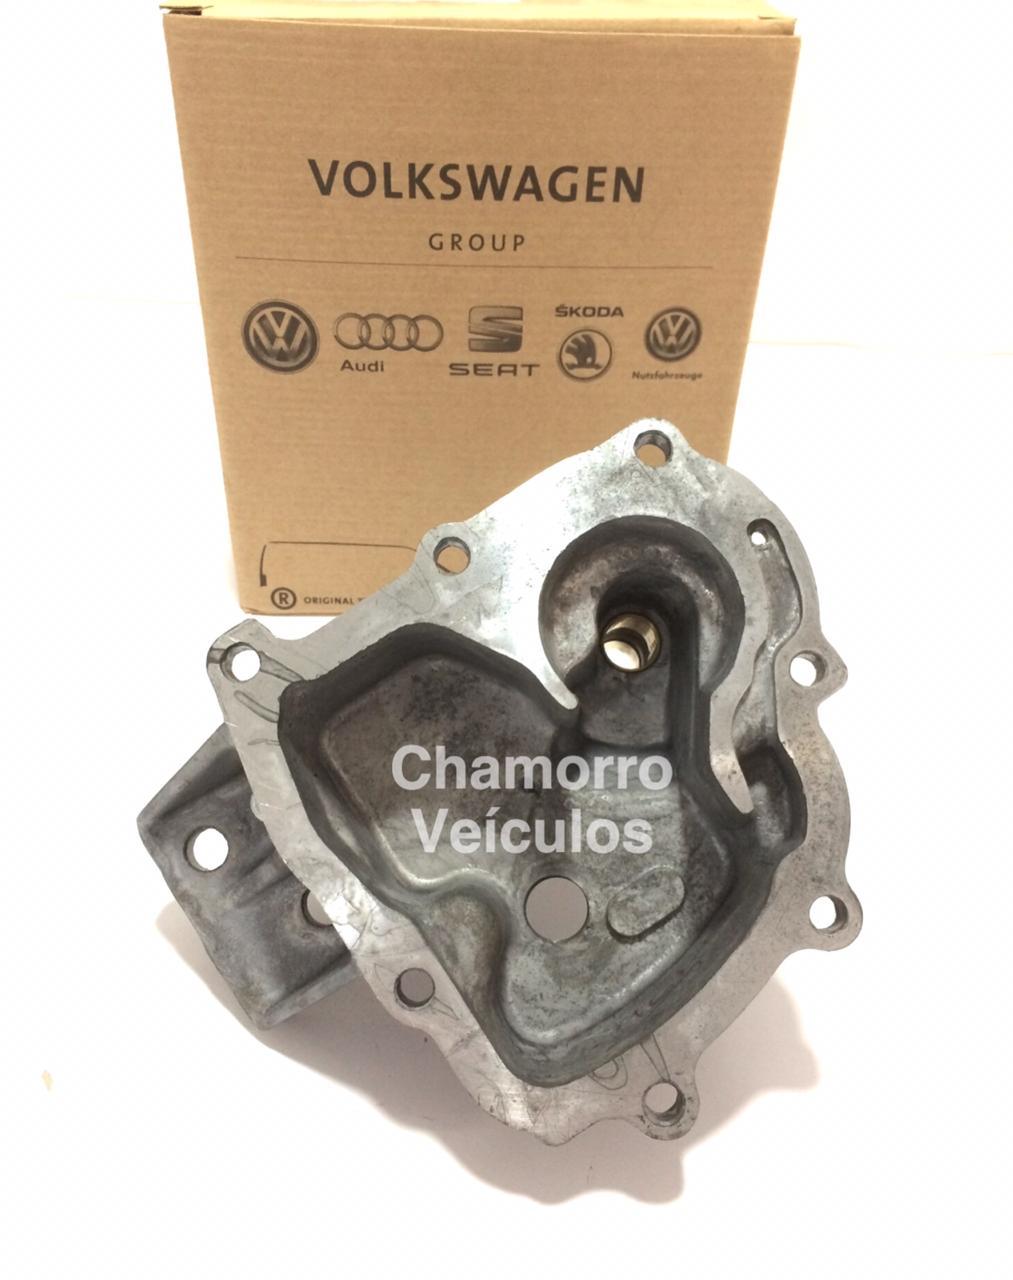 Tampa Do Cambio Volkswagen Kombi 1997 Até 2011 7X0301203D